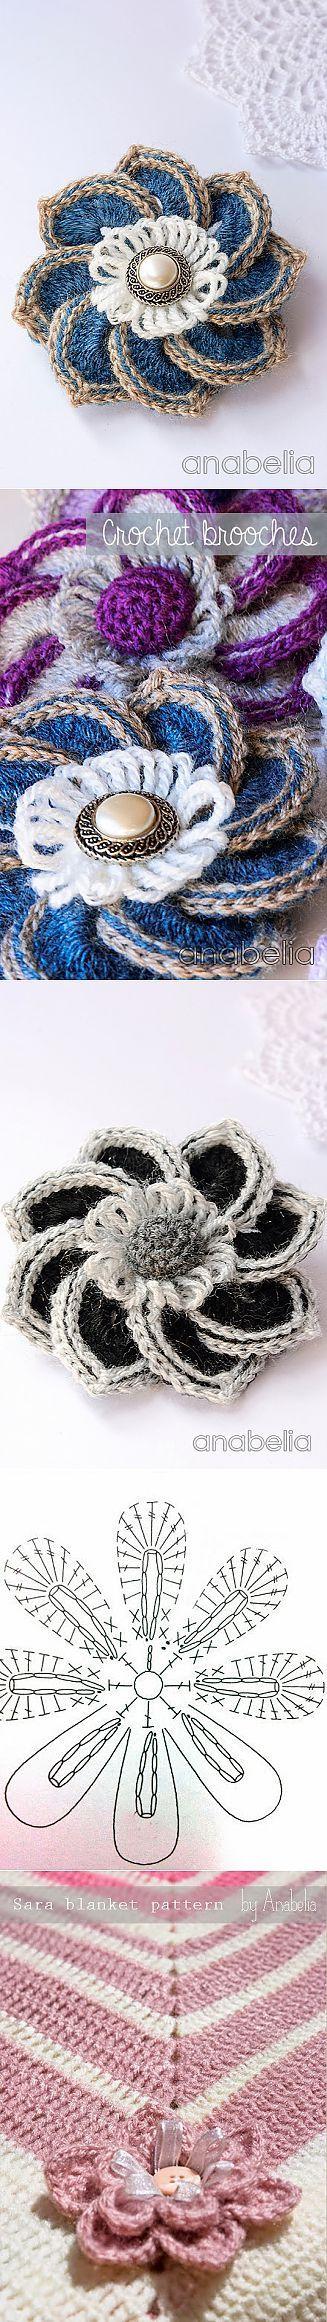 flores tejidas | Flores | Pinterest | Flores tejidas, Flores y Broches